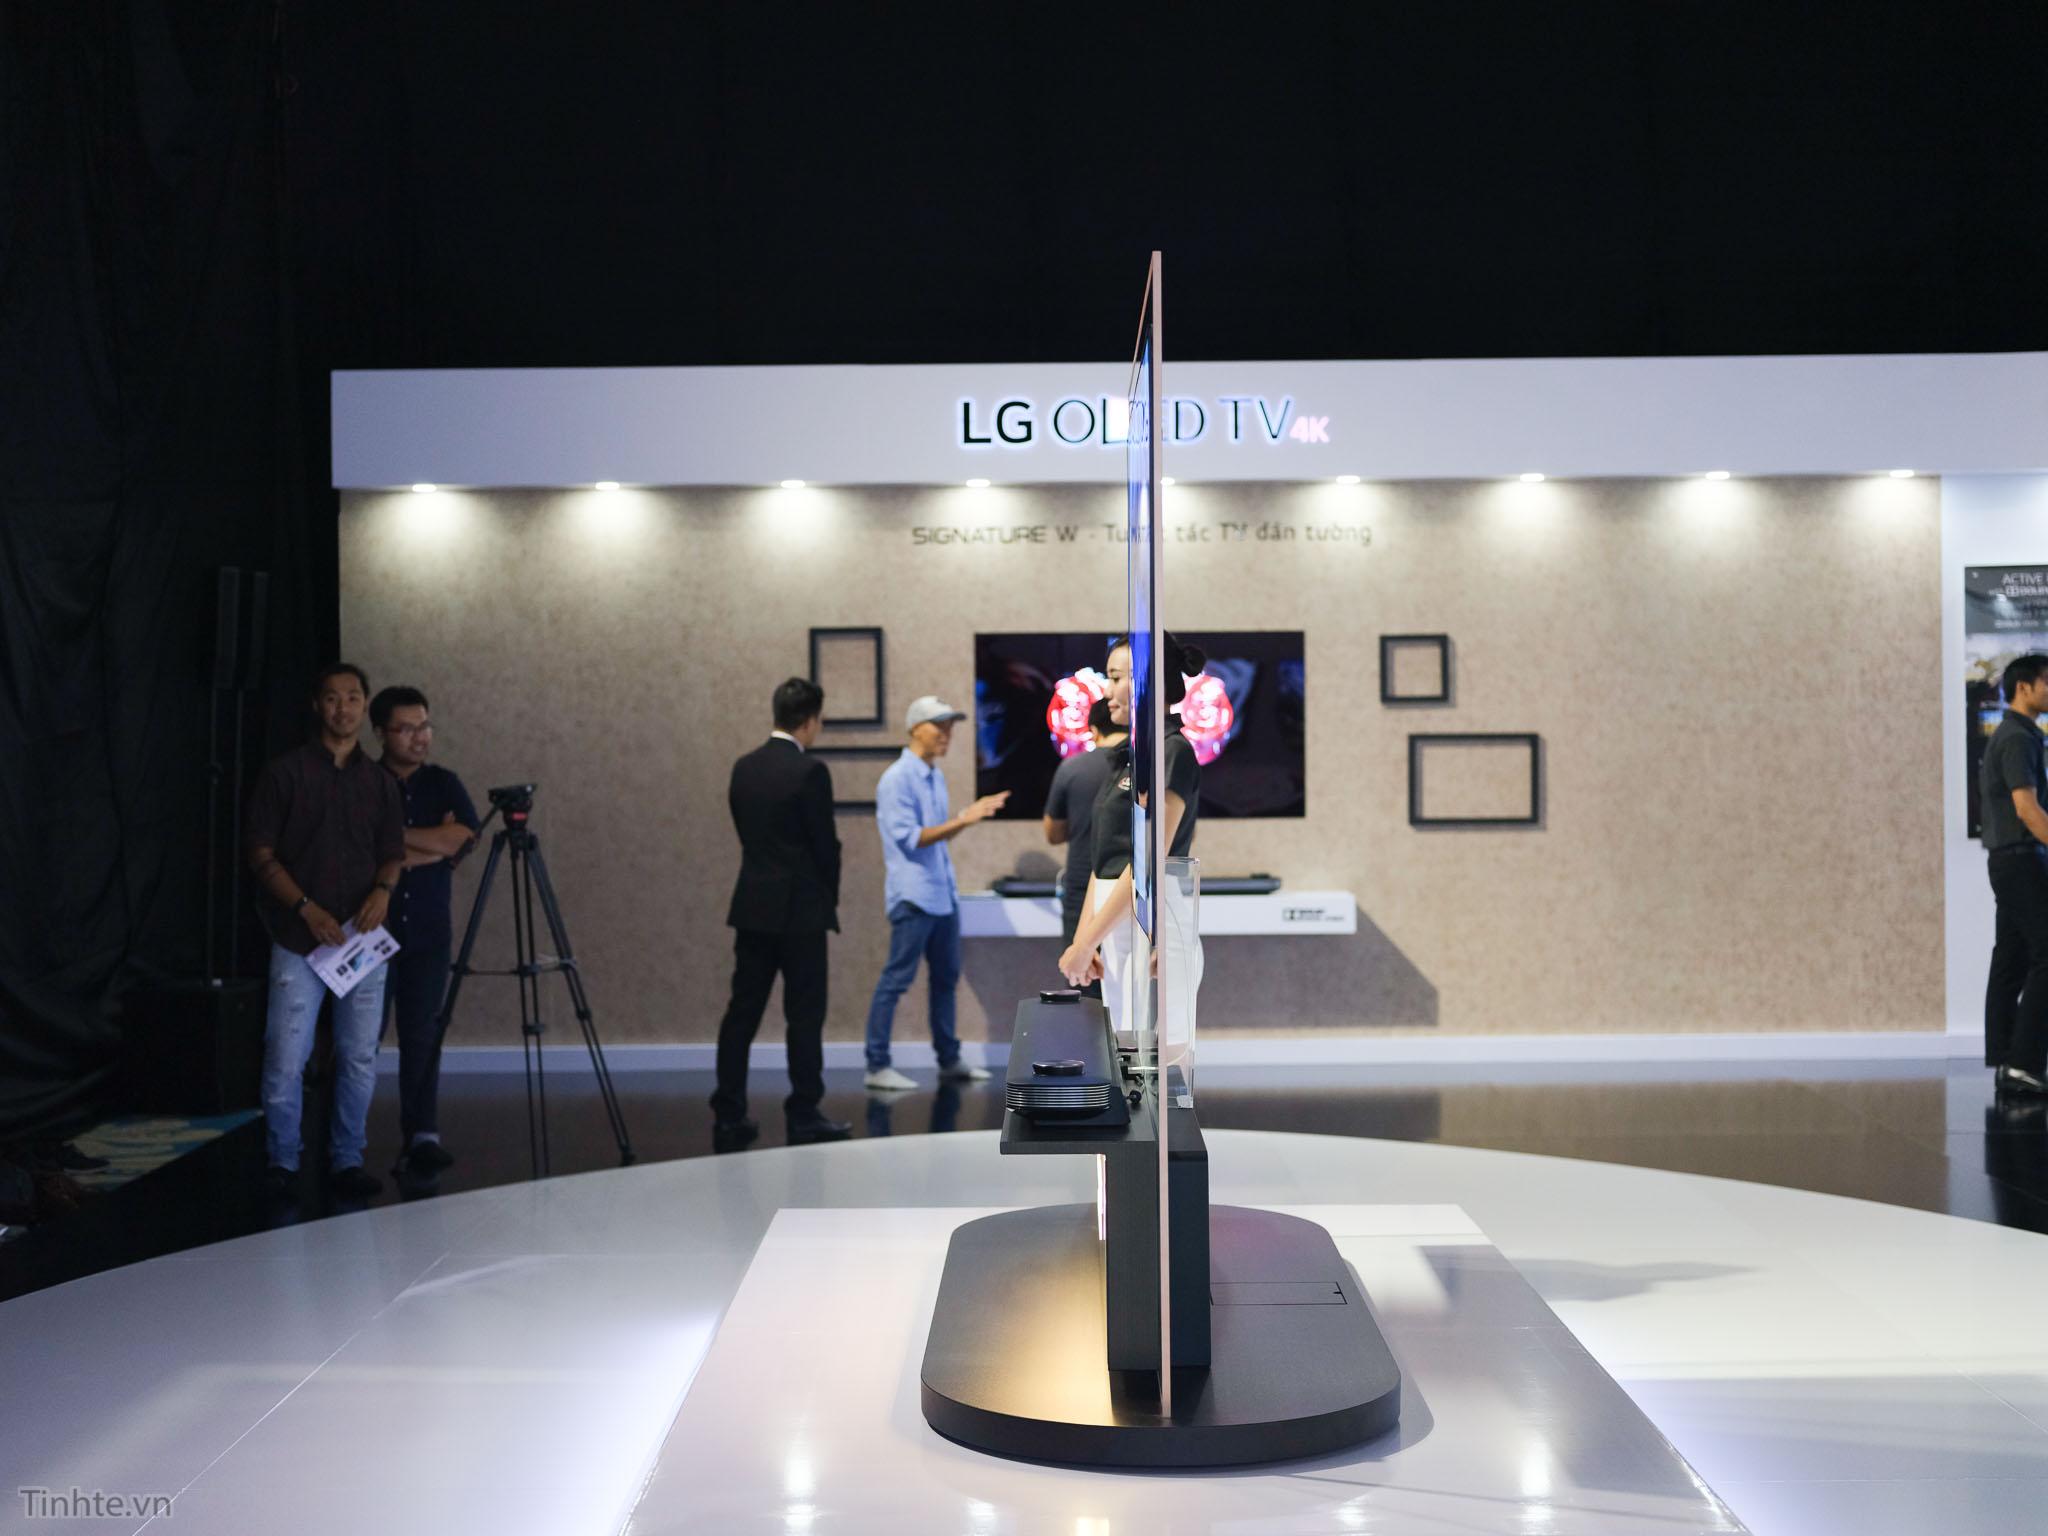 LG_OLED_Treo_tuong_tinhte.vn-10.jpg